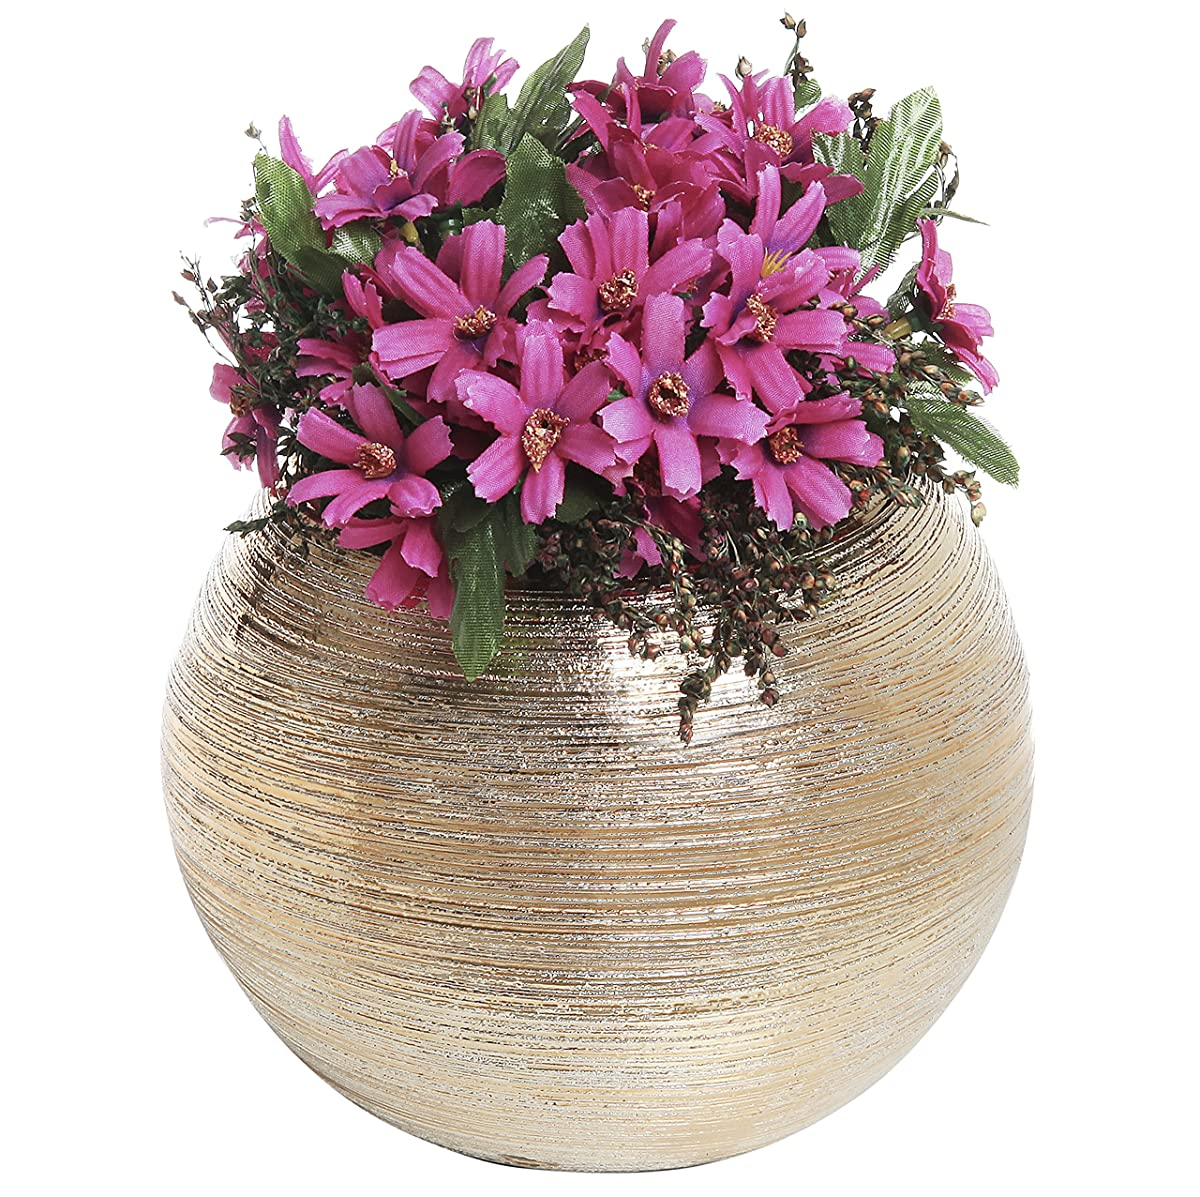 Round Modern Metallic Gold Tone Ridged Ceramic Plant Flower Planter Pot